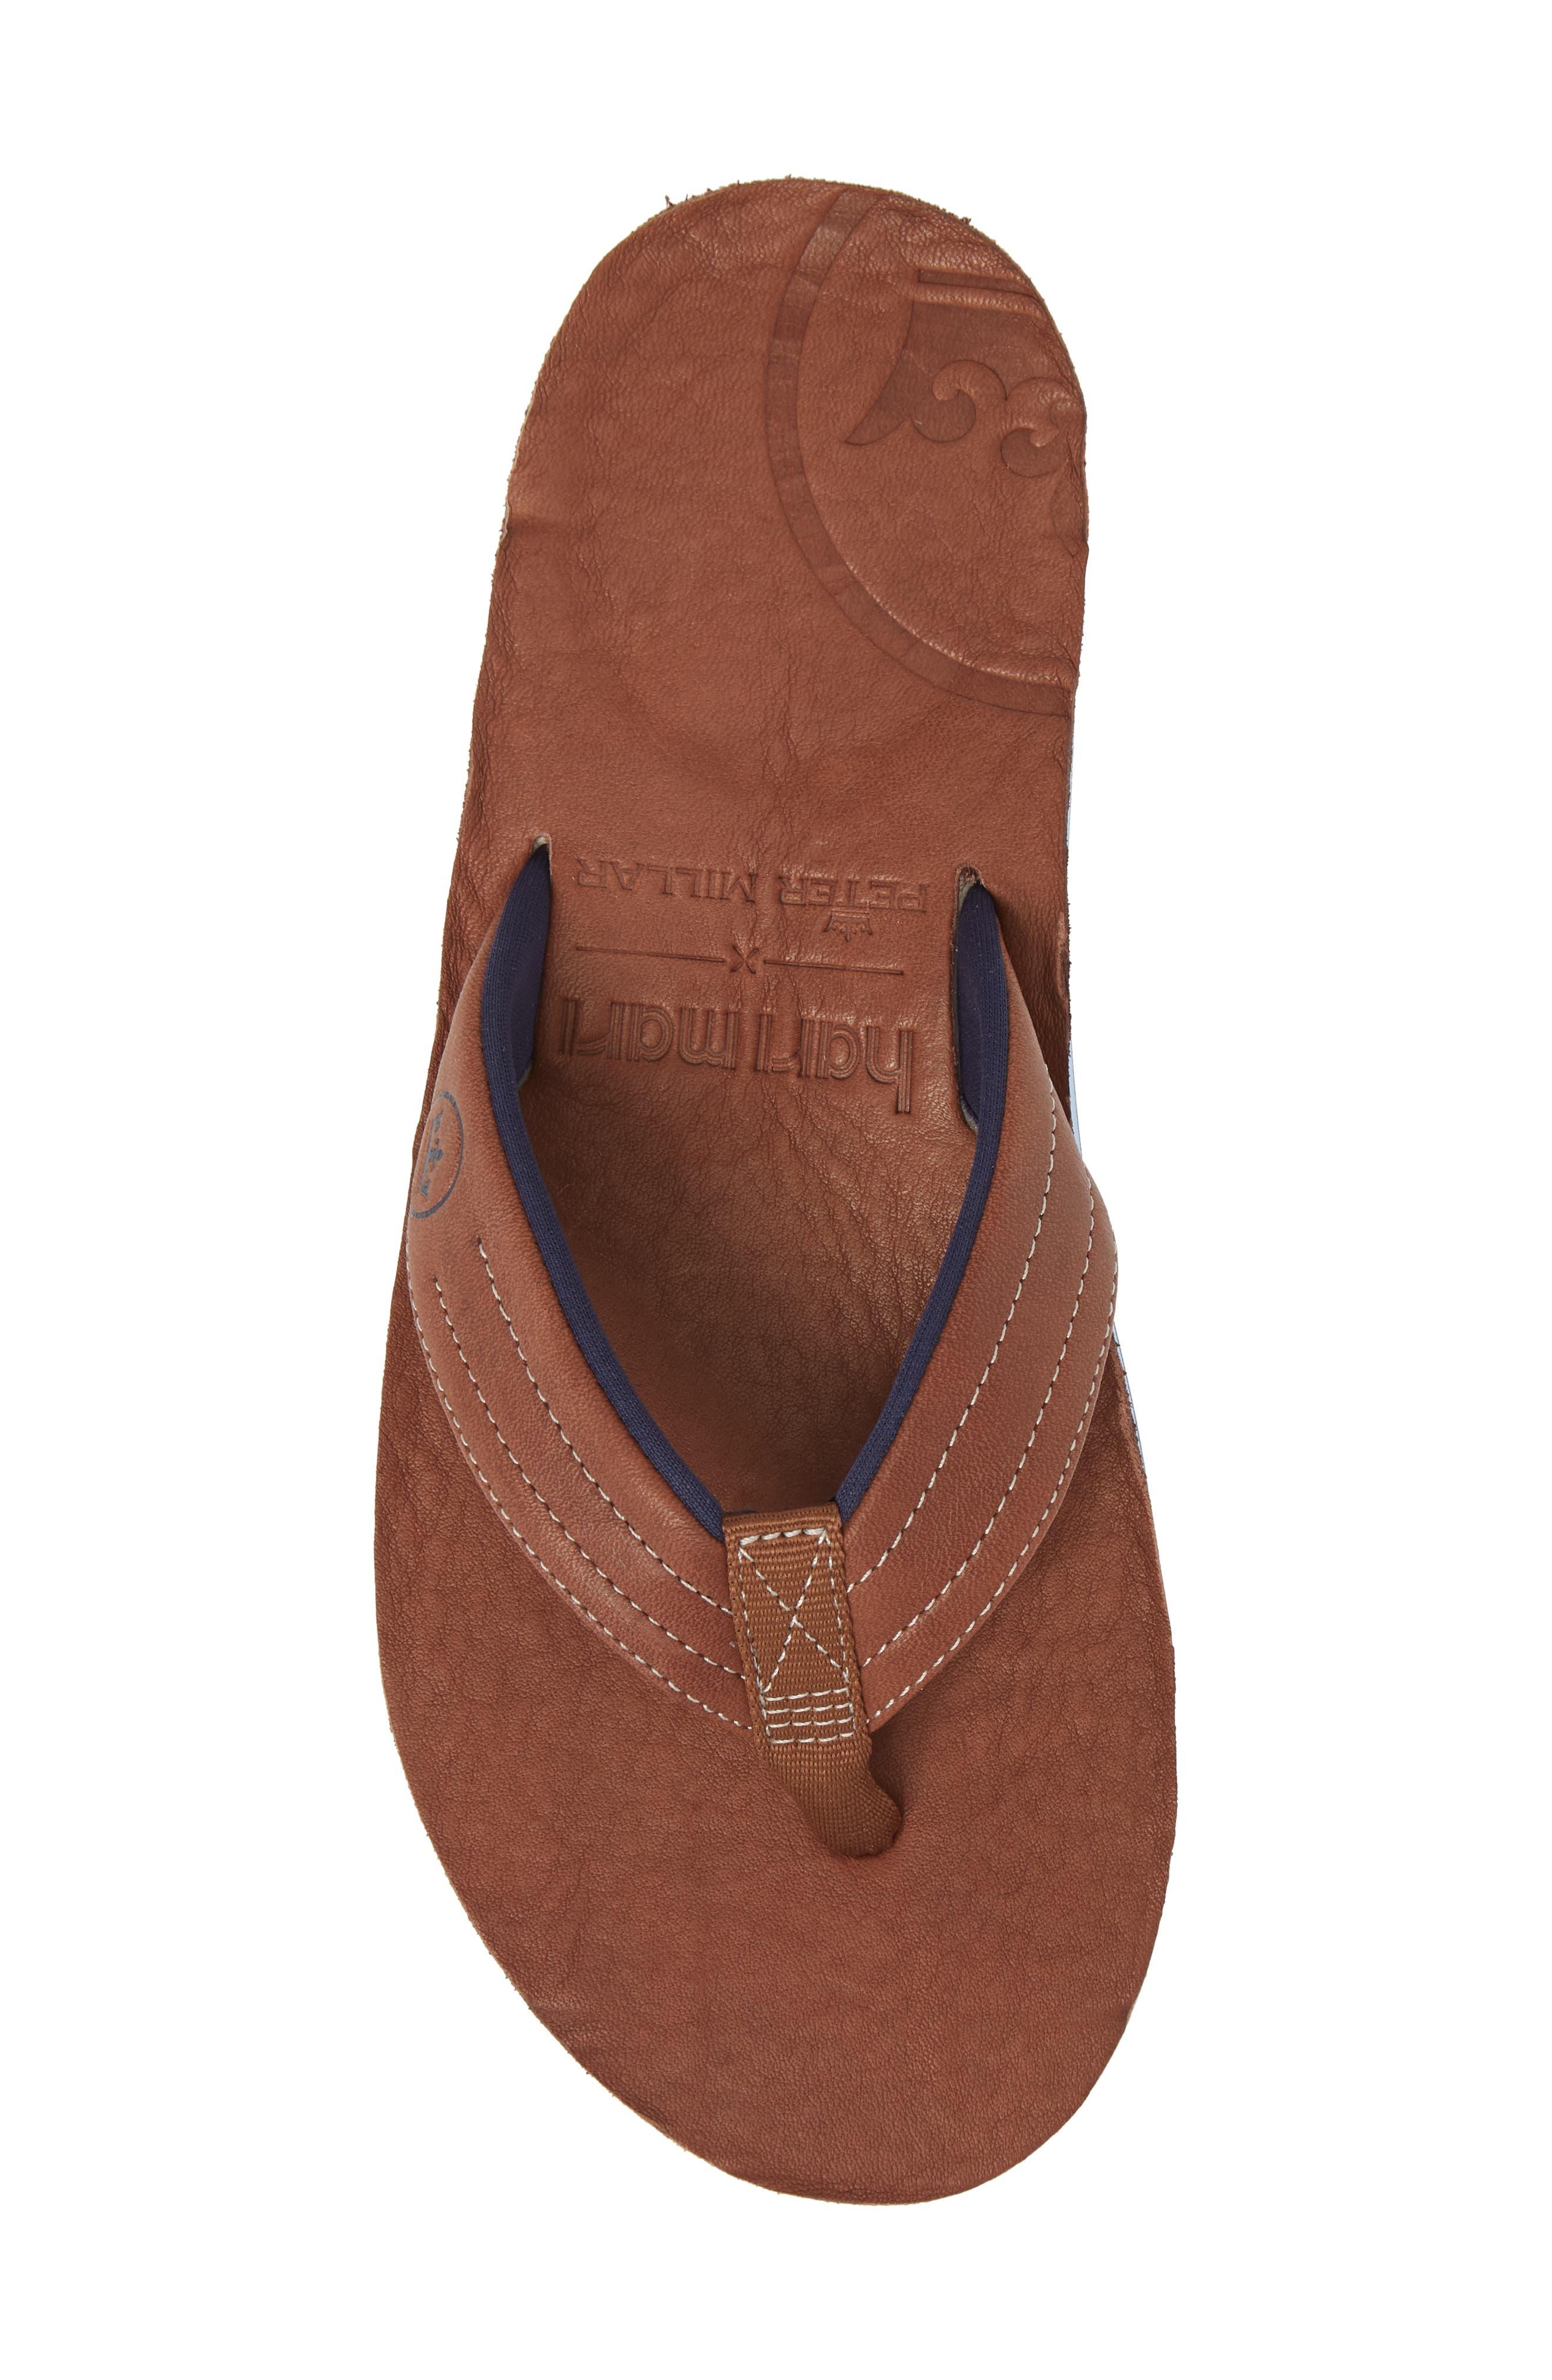 x Peter Millar Leather Flip Flop,                             Alternate thumbnail 5, color,                             Dark Chocolate Leather